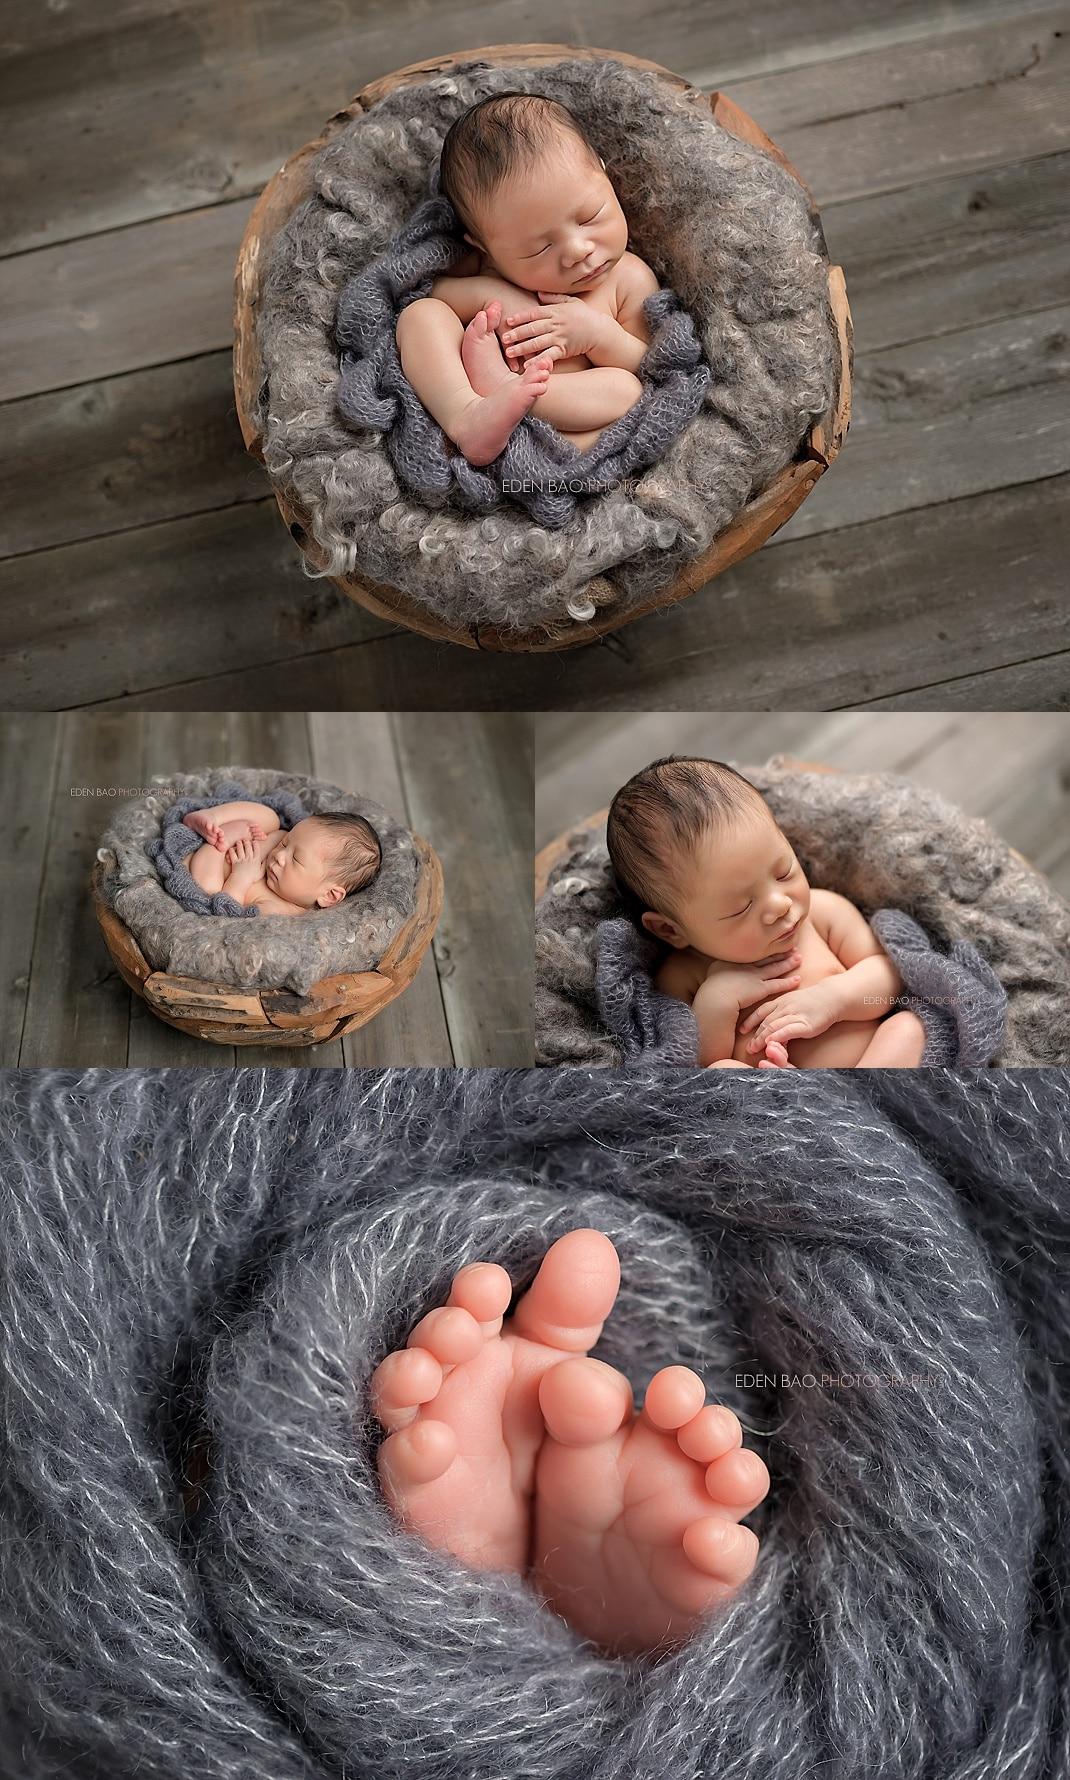 renton-newborn-photographer-baby-with-grey-blanket